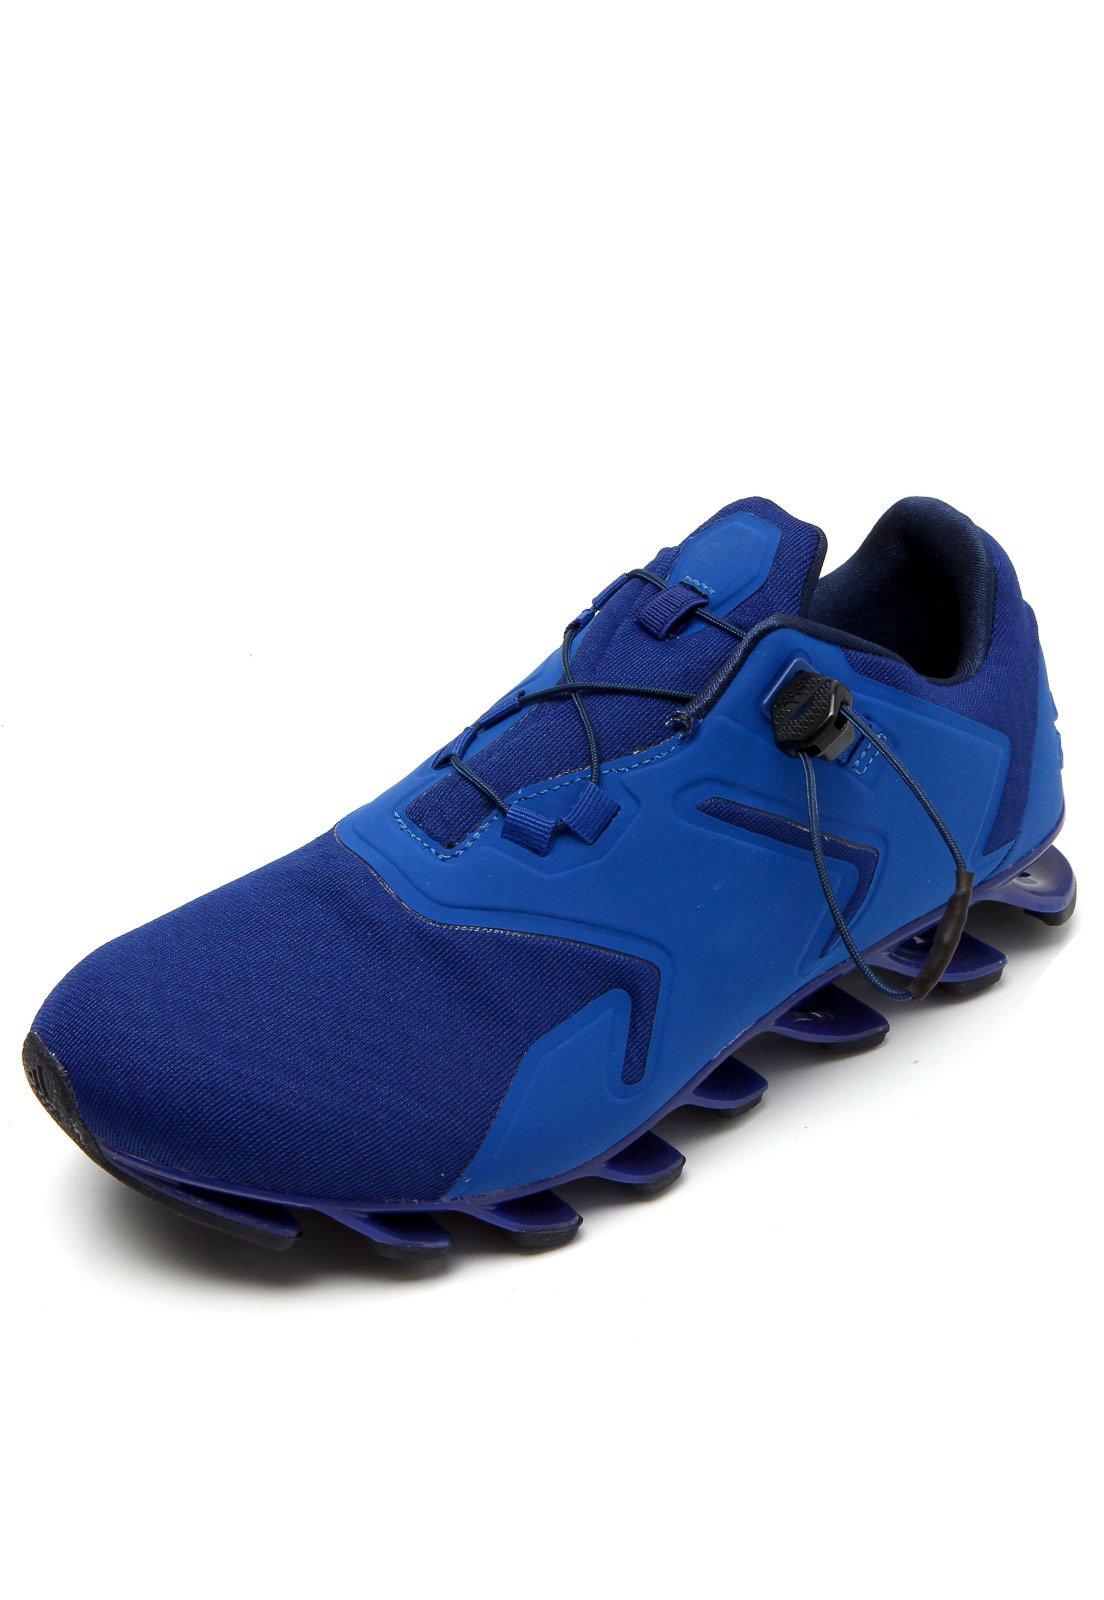 Devastar pubertad Universal  Tênis adidas Performance Springblade Solyce Azul - Compre Agora   Kanui  Brasil